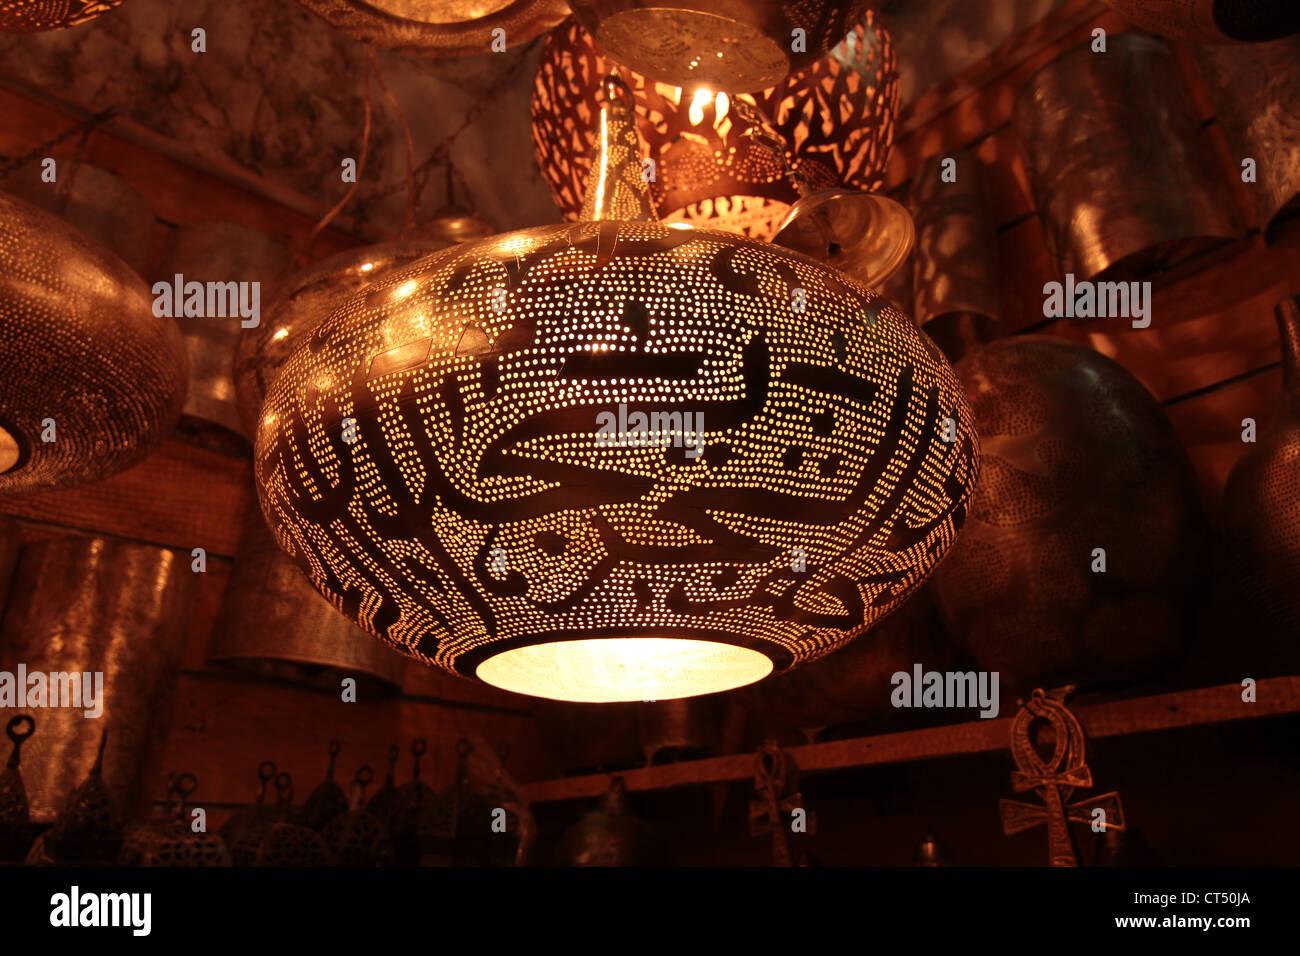 Islamic lampshade in lamp shop in khan el khalili bazaar in cairo islamic lampshade in lamp shop in khan el khalili bazaar in cairo mozeypictures Choice Image